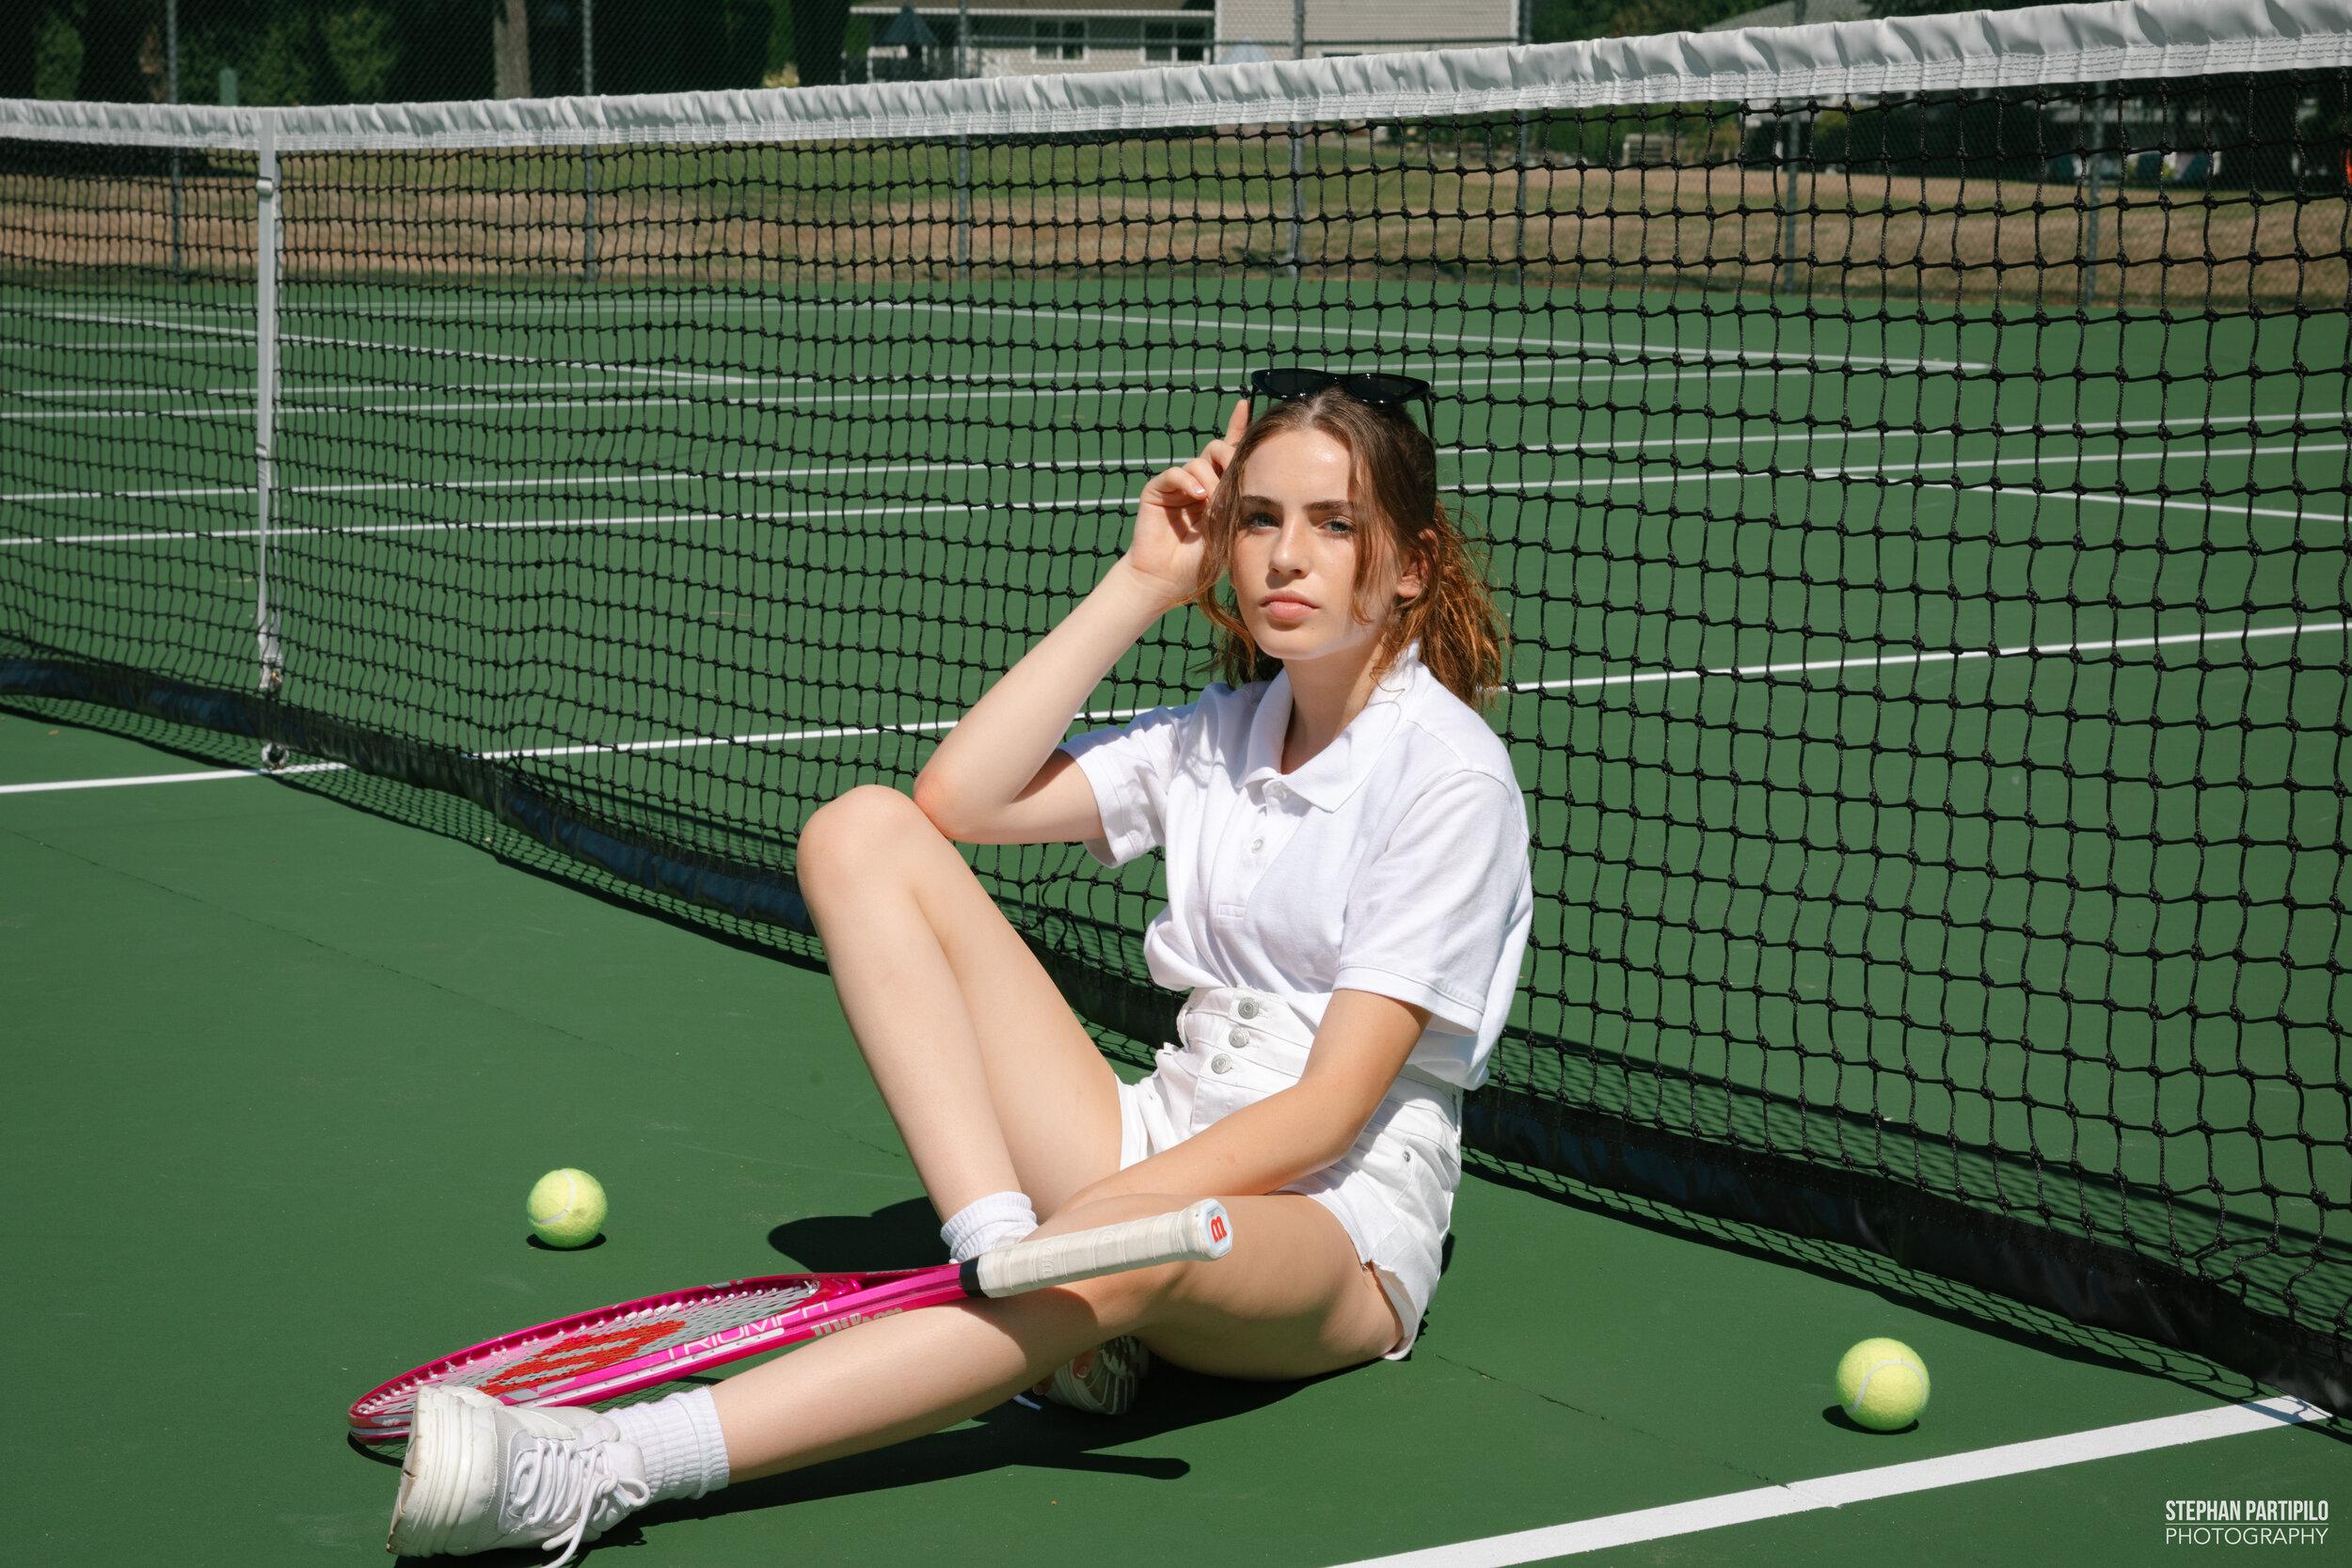 Karin Tennis Golf 2019 SP Favs IG 0G5A1193.jpg